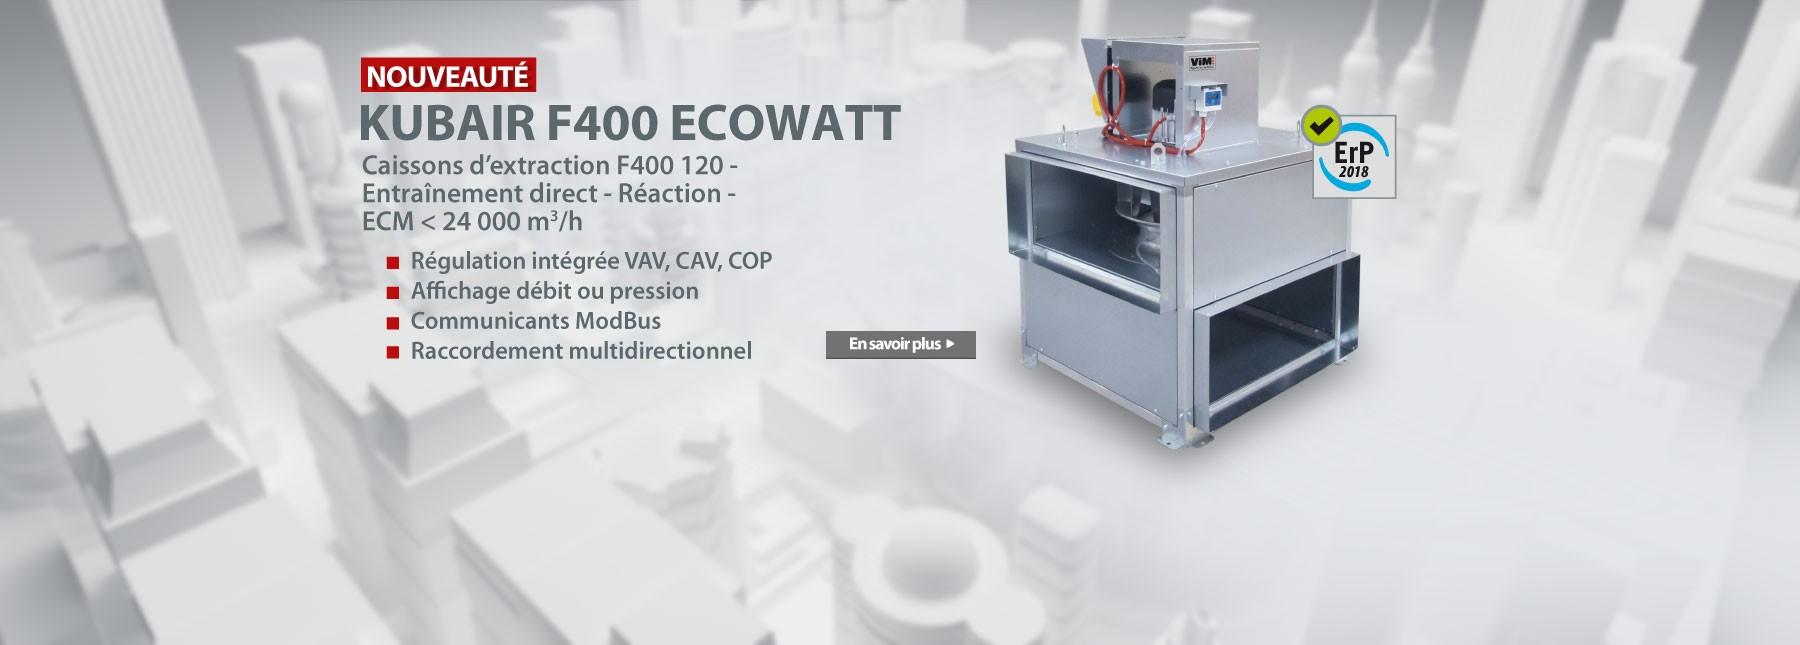 KUBAIR F400 - KUBAIR F400 ECOWATT